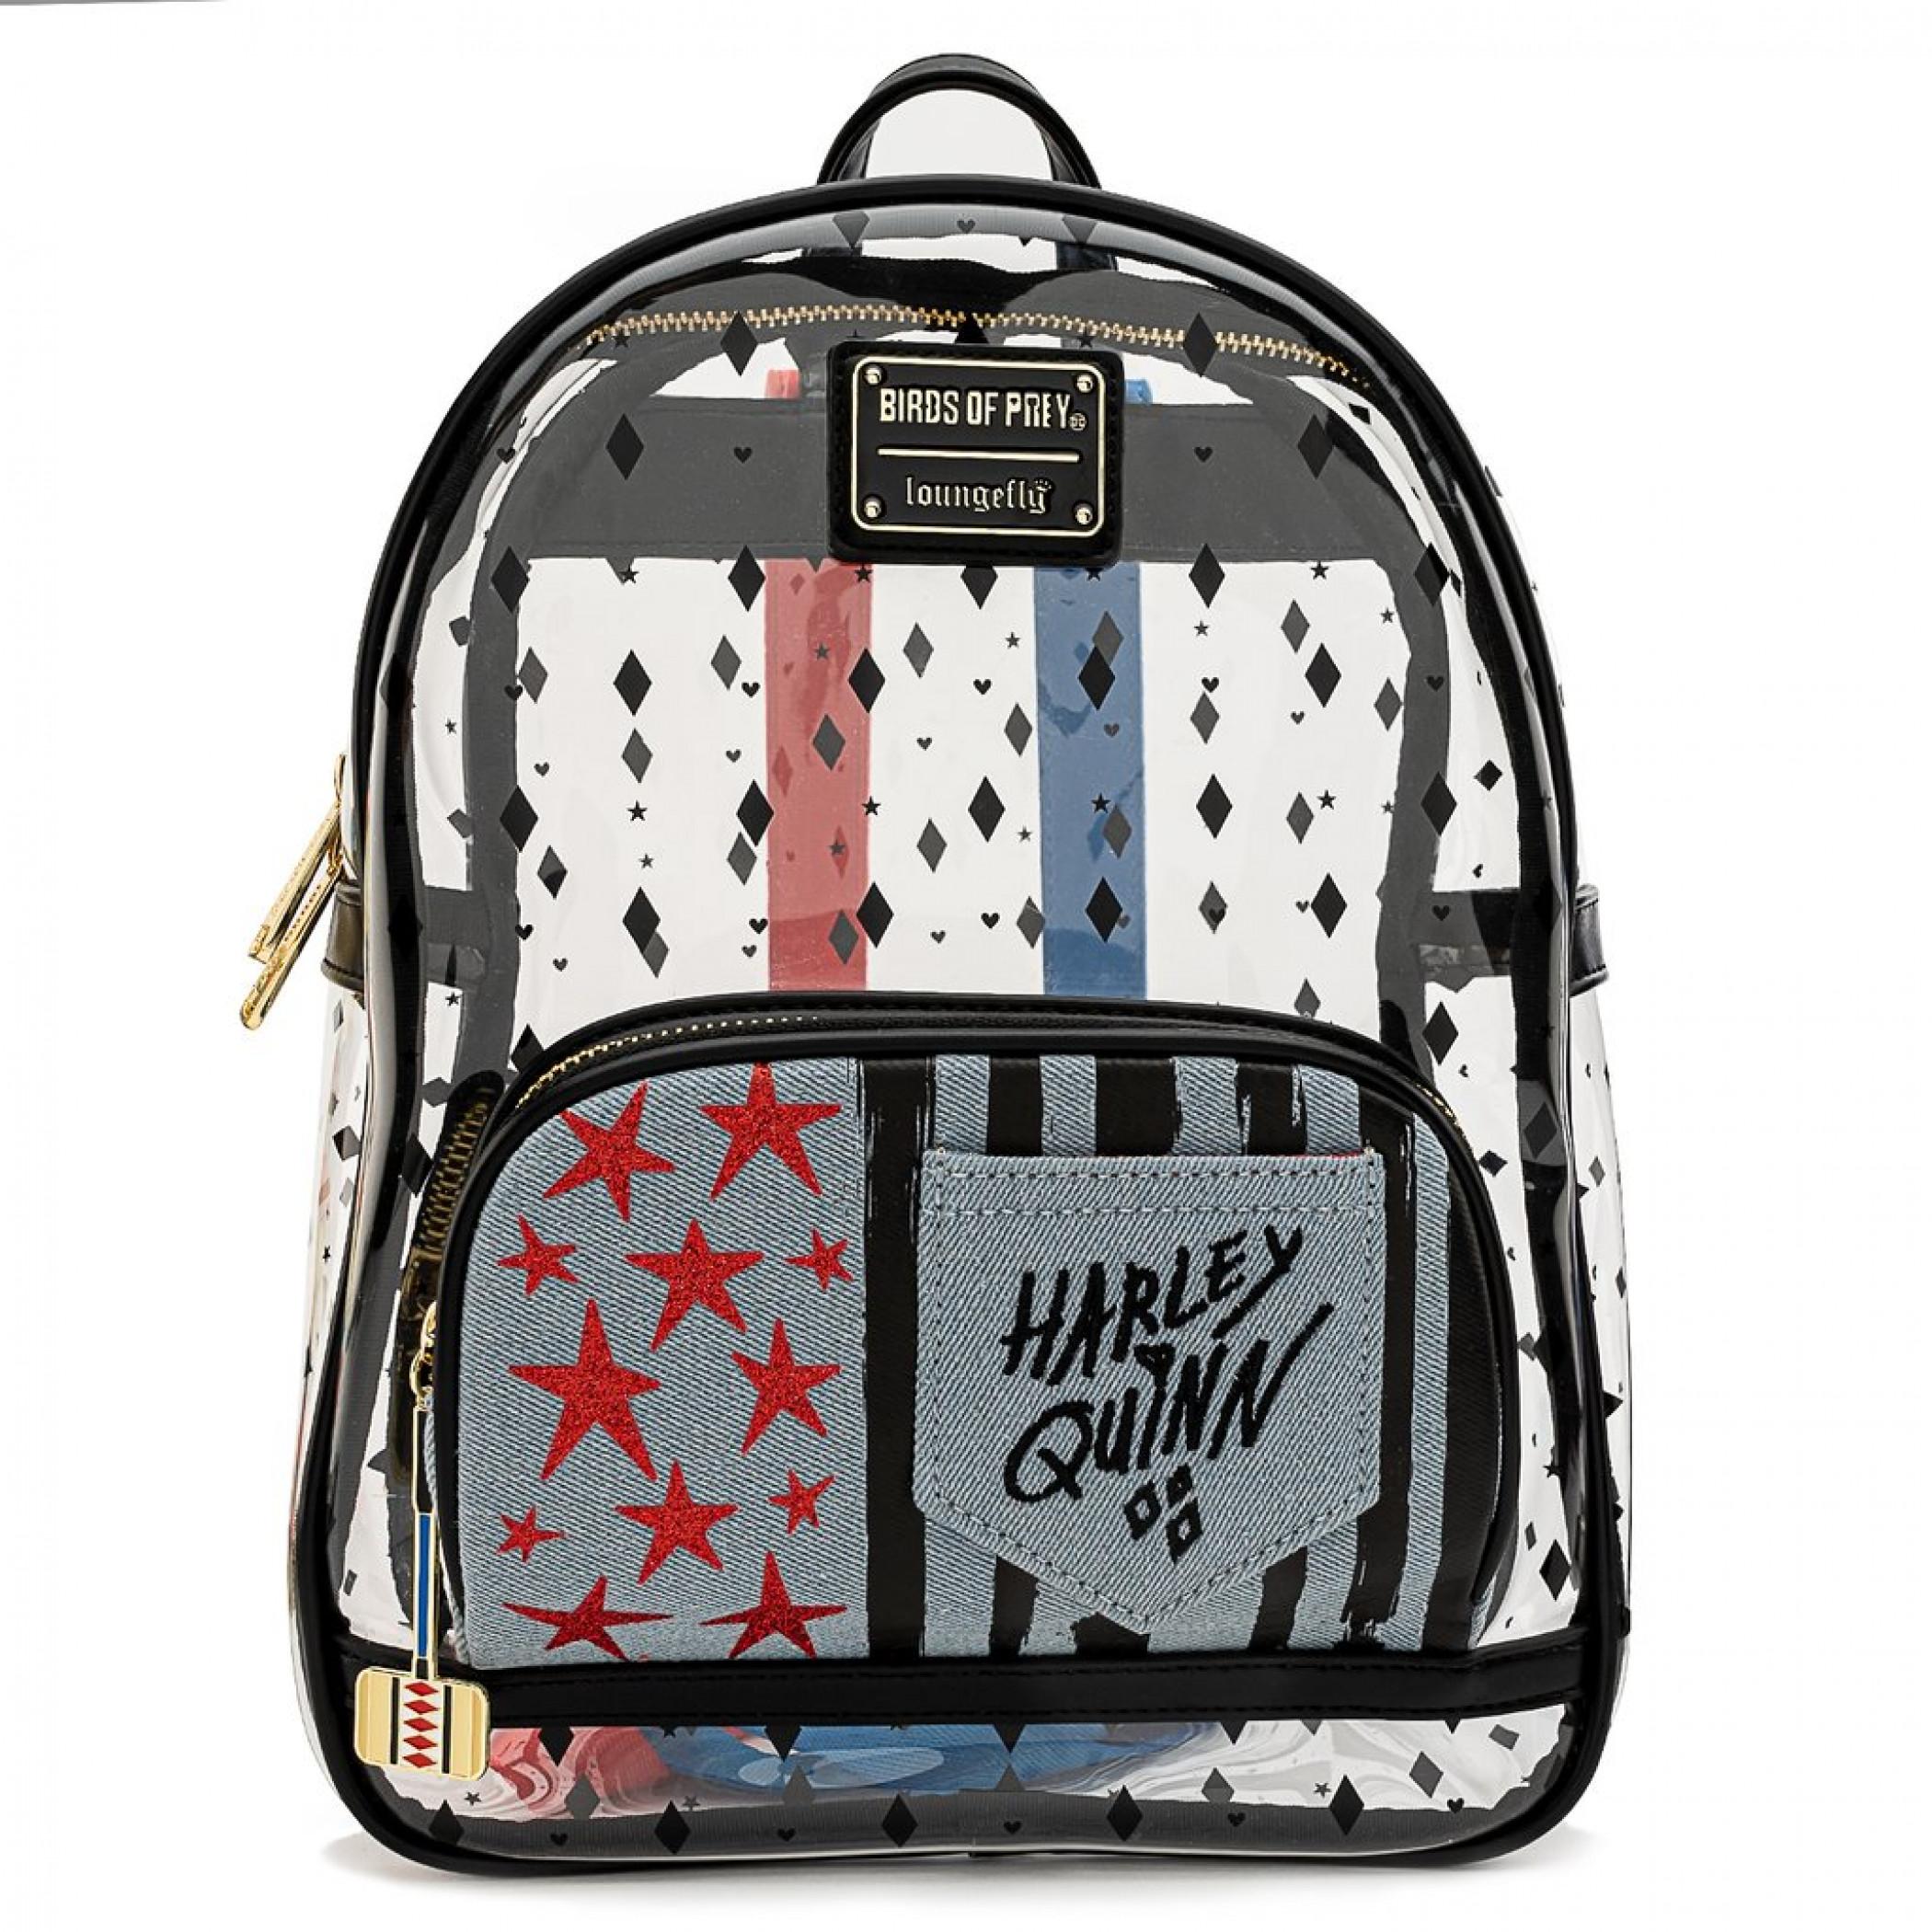 Birds of Prey Harley Quinn Mini Backpack